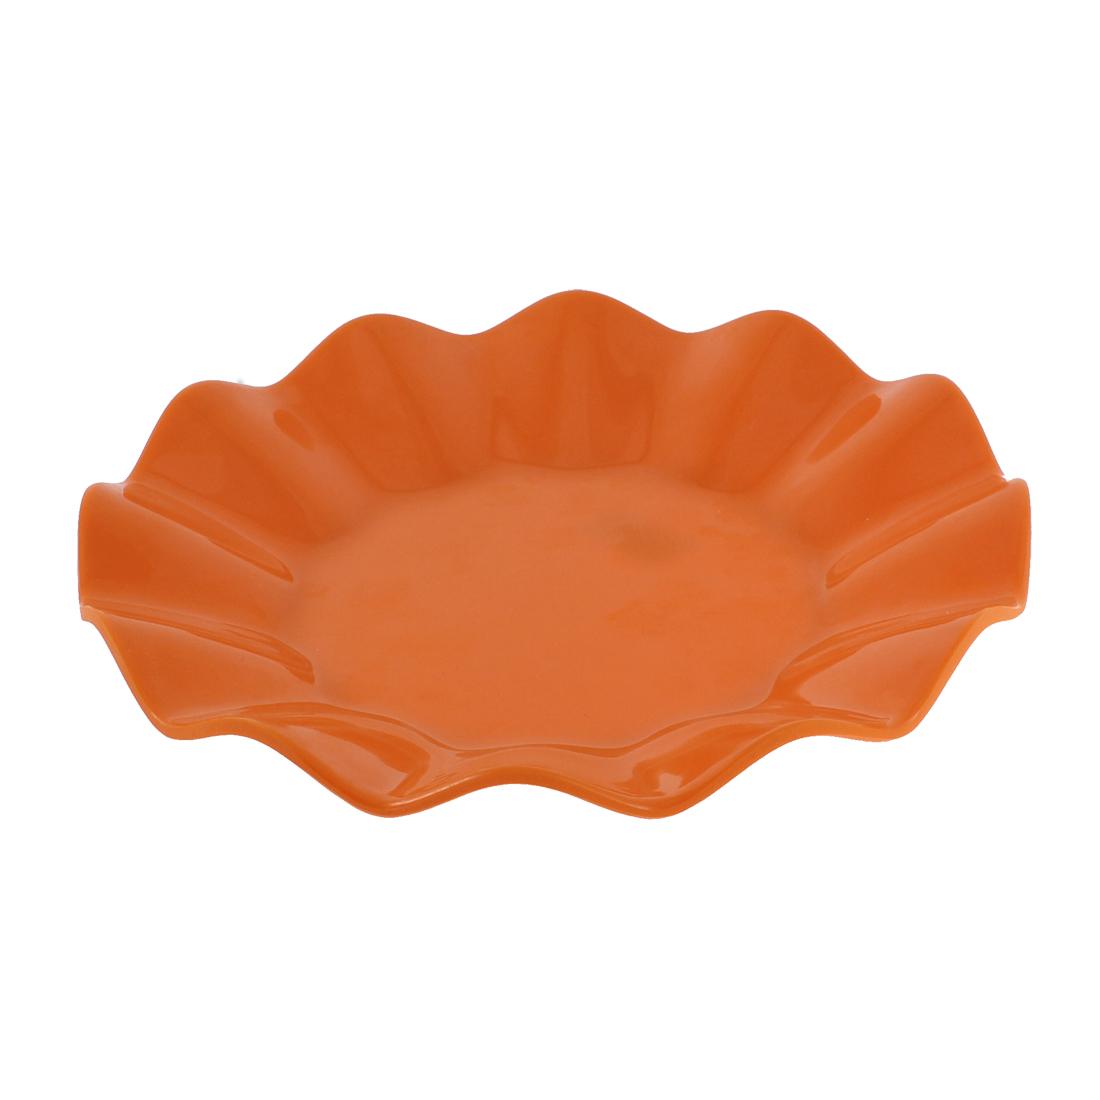 Outdoor Dining Plastic Lotus Leaf Shaped Wave Edge Dish Plate Saucer Orange